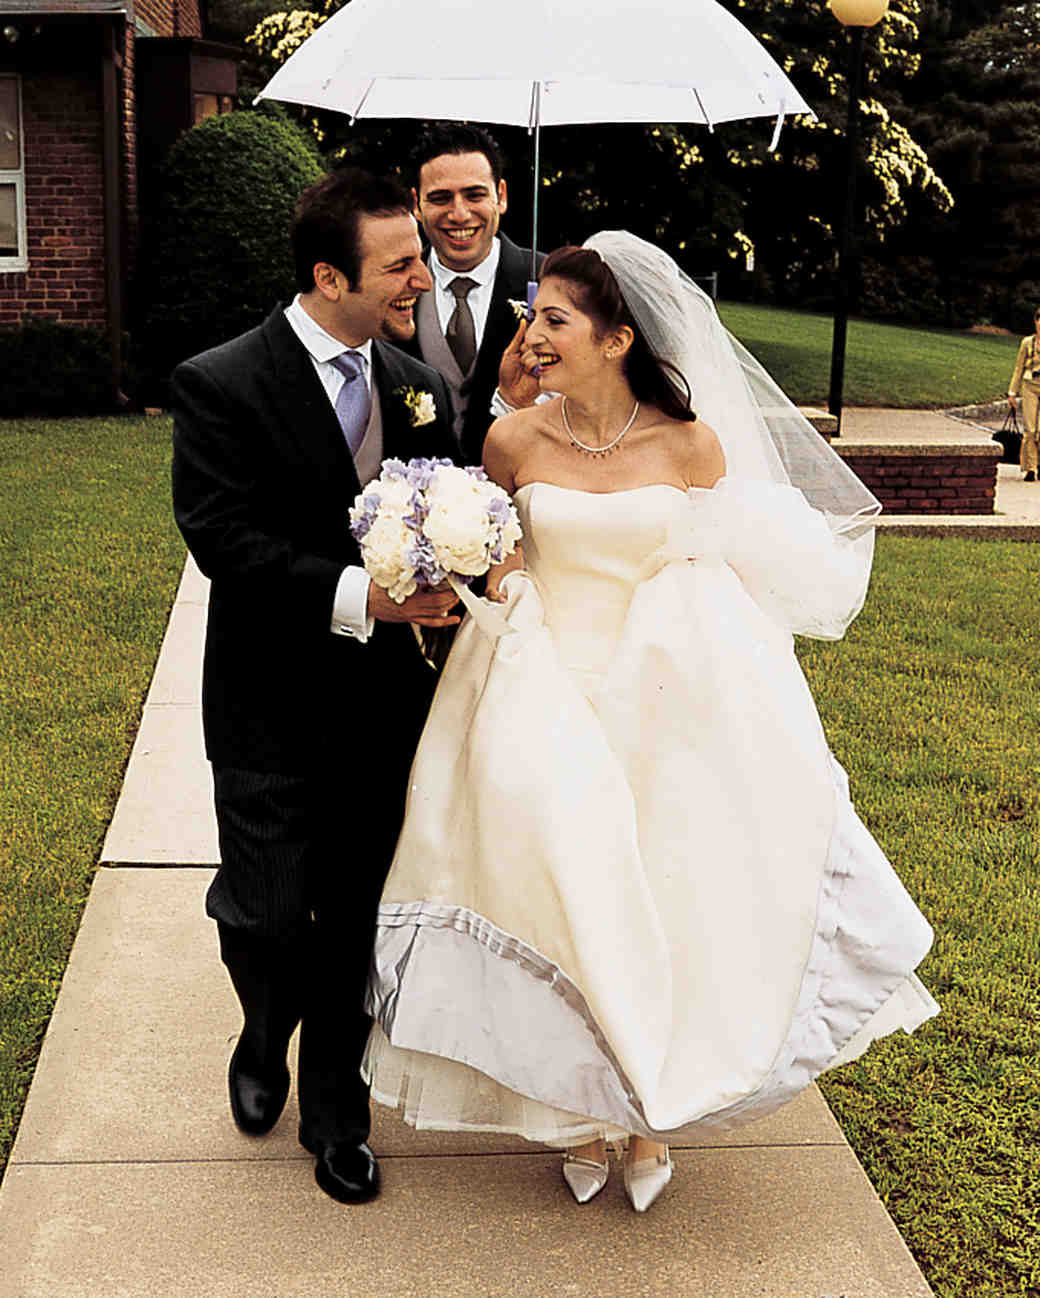 marriage-tips-anne-david-f04-mw1004toca1-0215.jpg